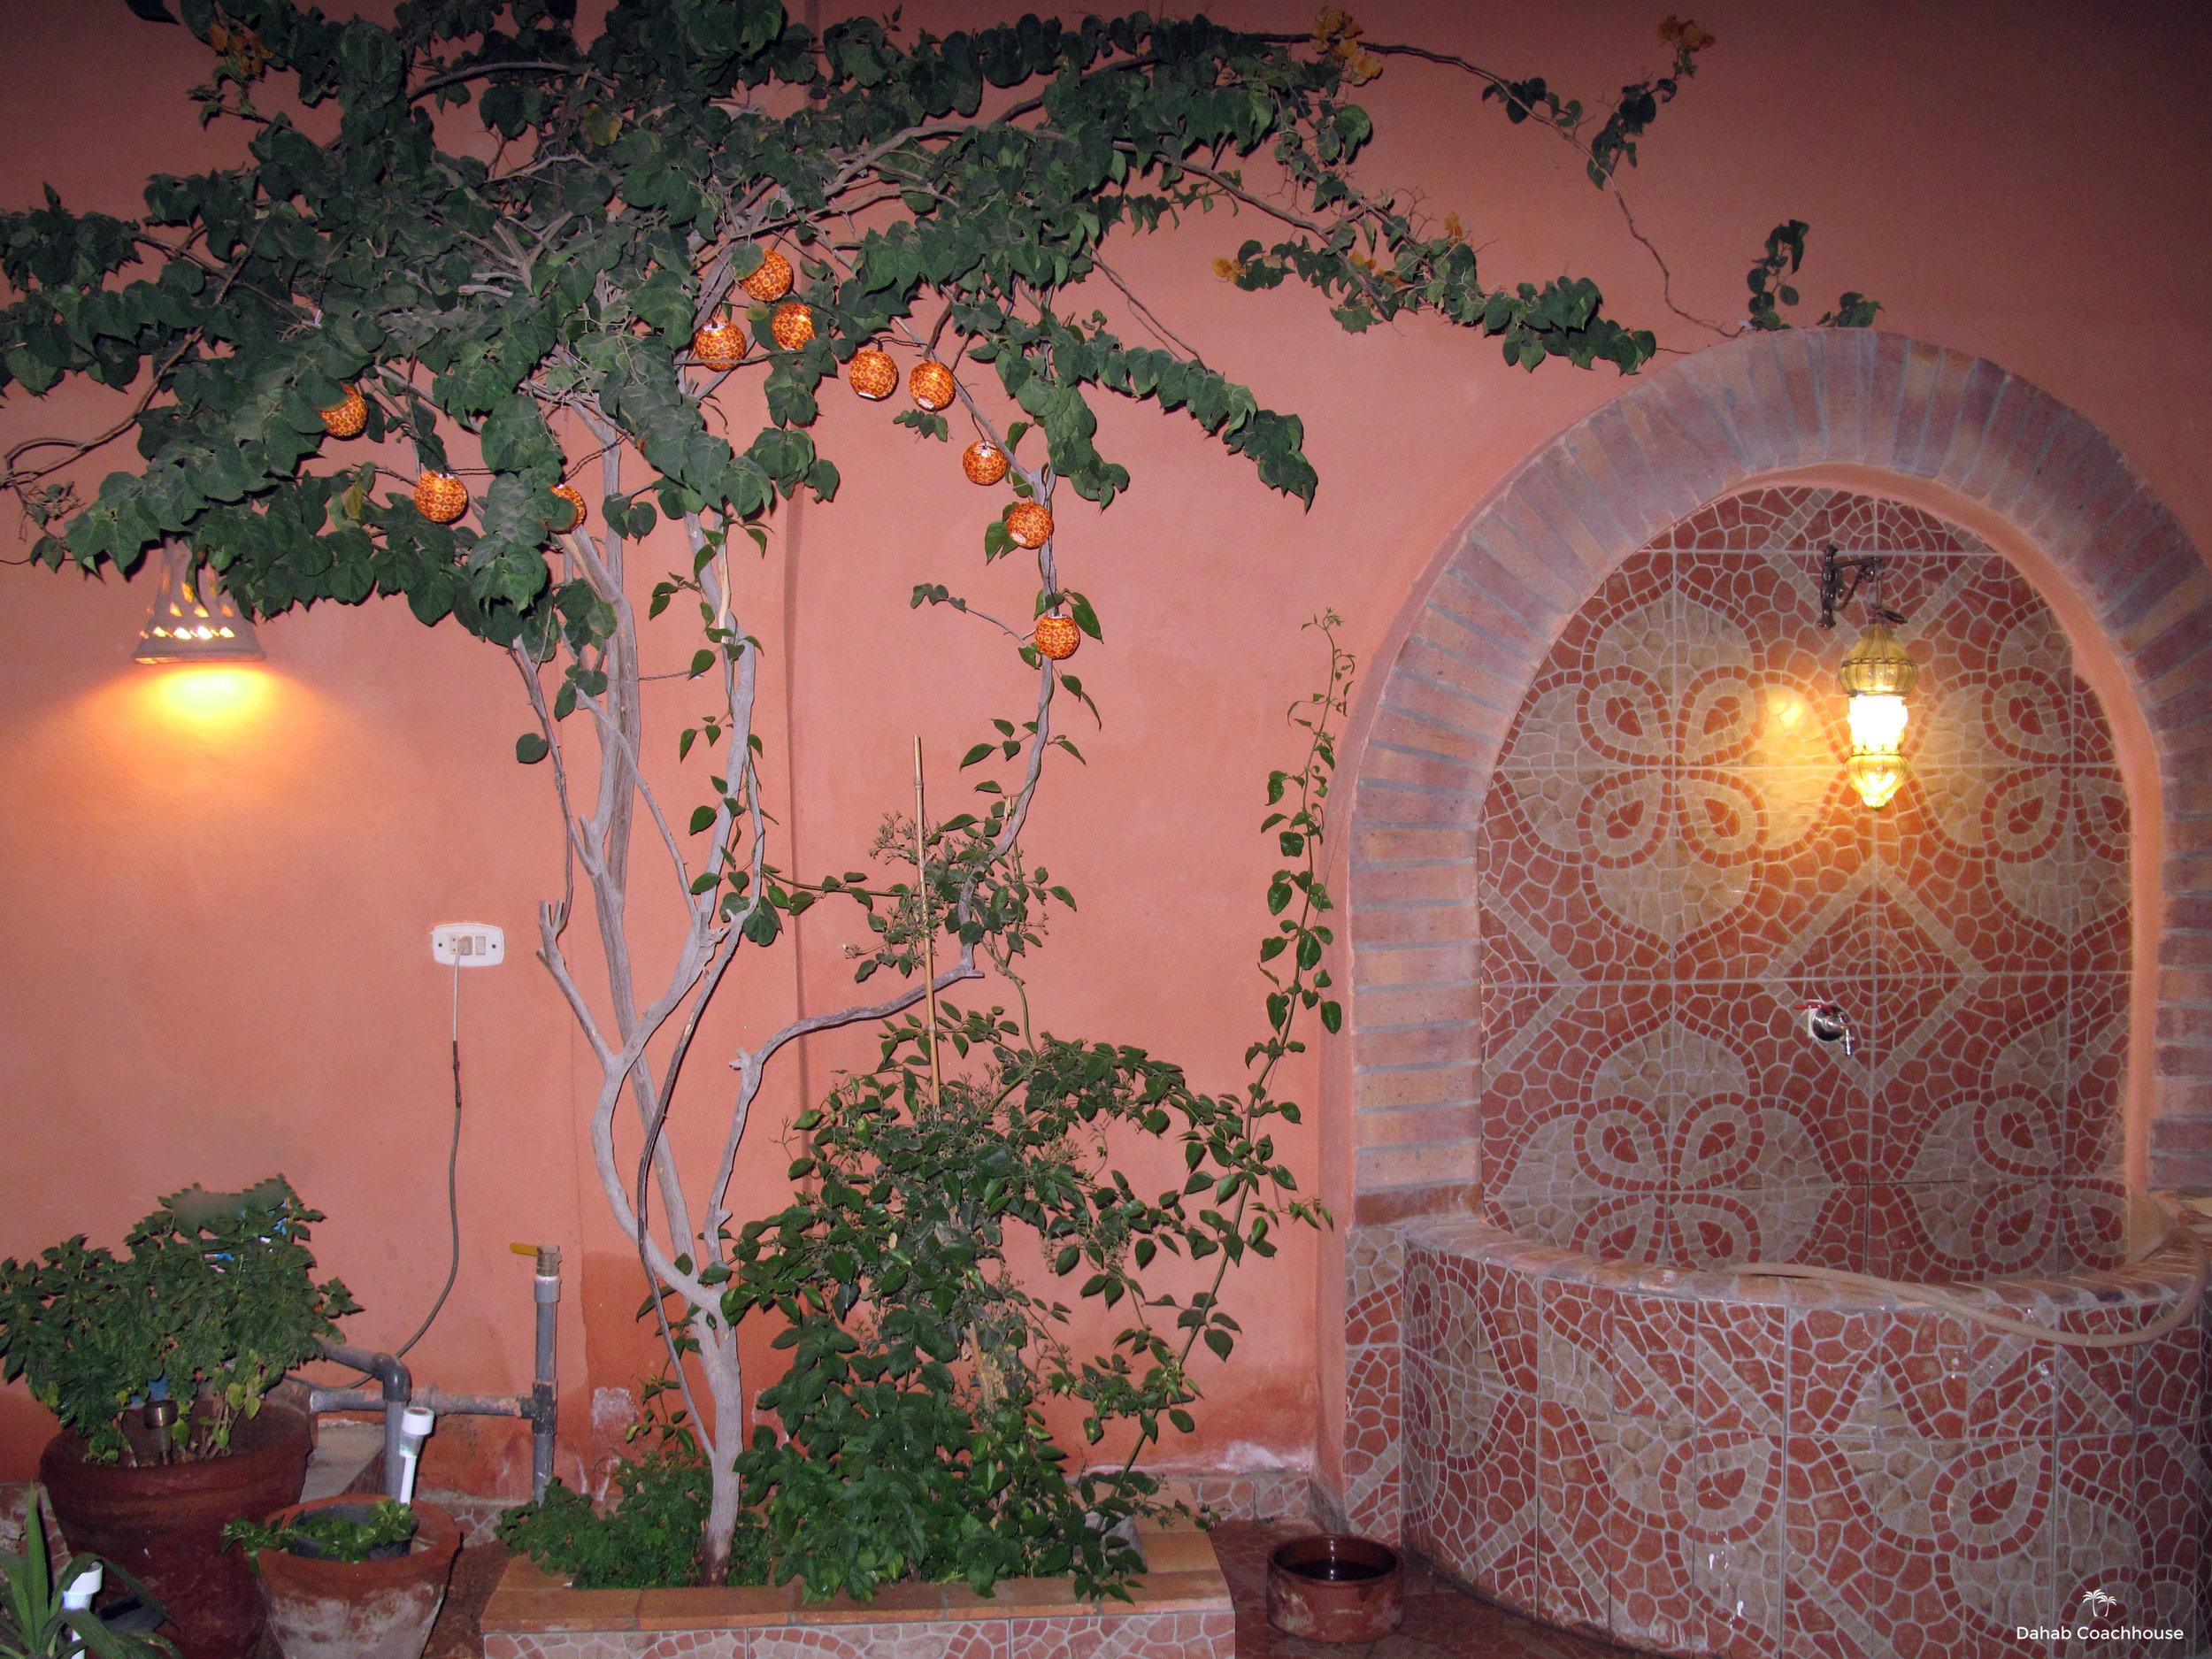 Dahab_Coachhouse_courtyard_hotel_guesthouse_beach_diving_sea_Egypt_garden_lights_Egypt.JPG